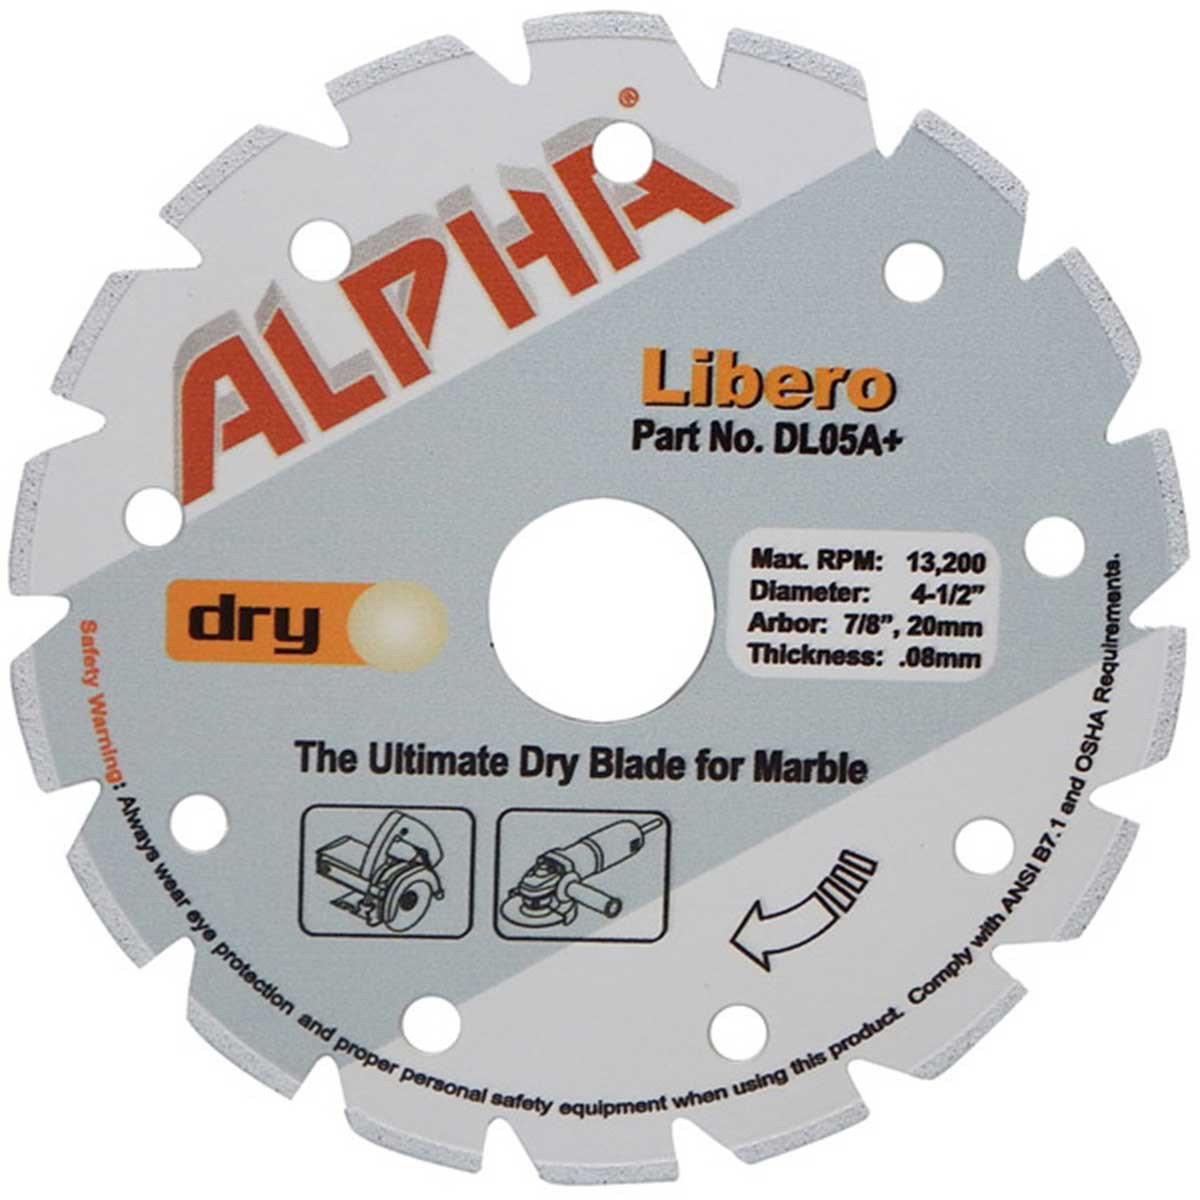 alpha libero 4 1/2in dry marble diamond blade